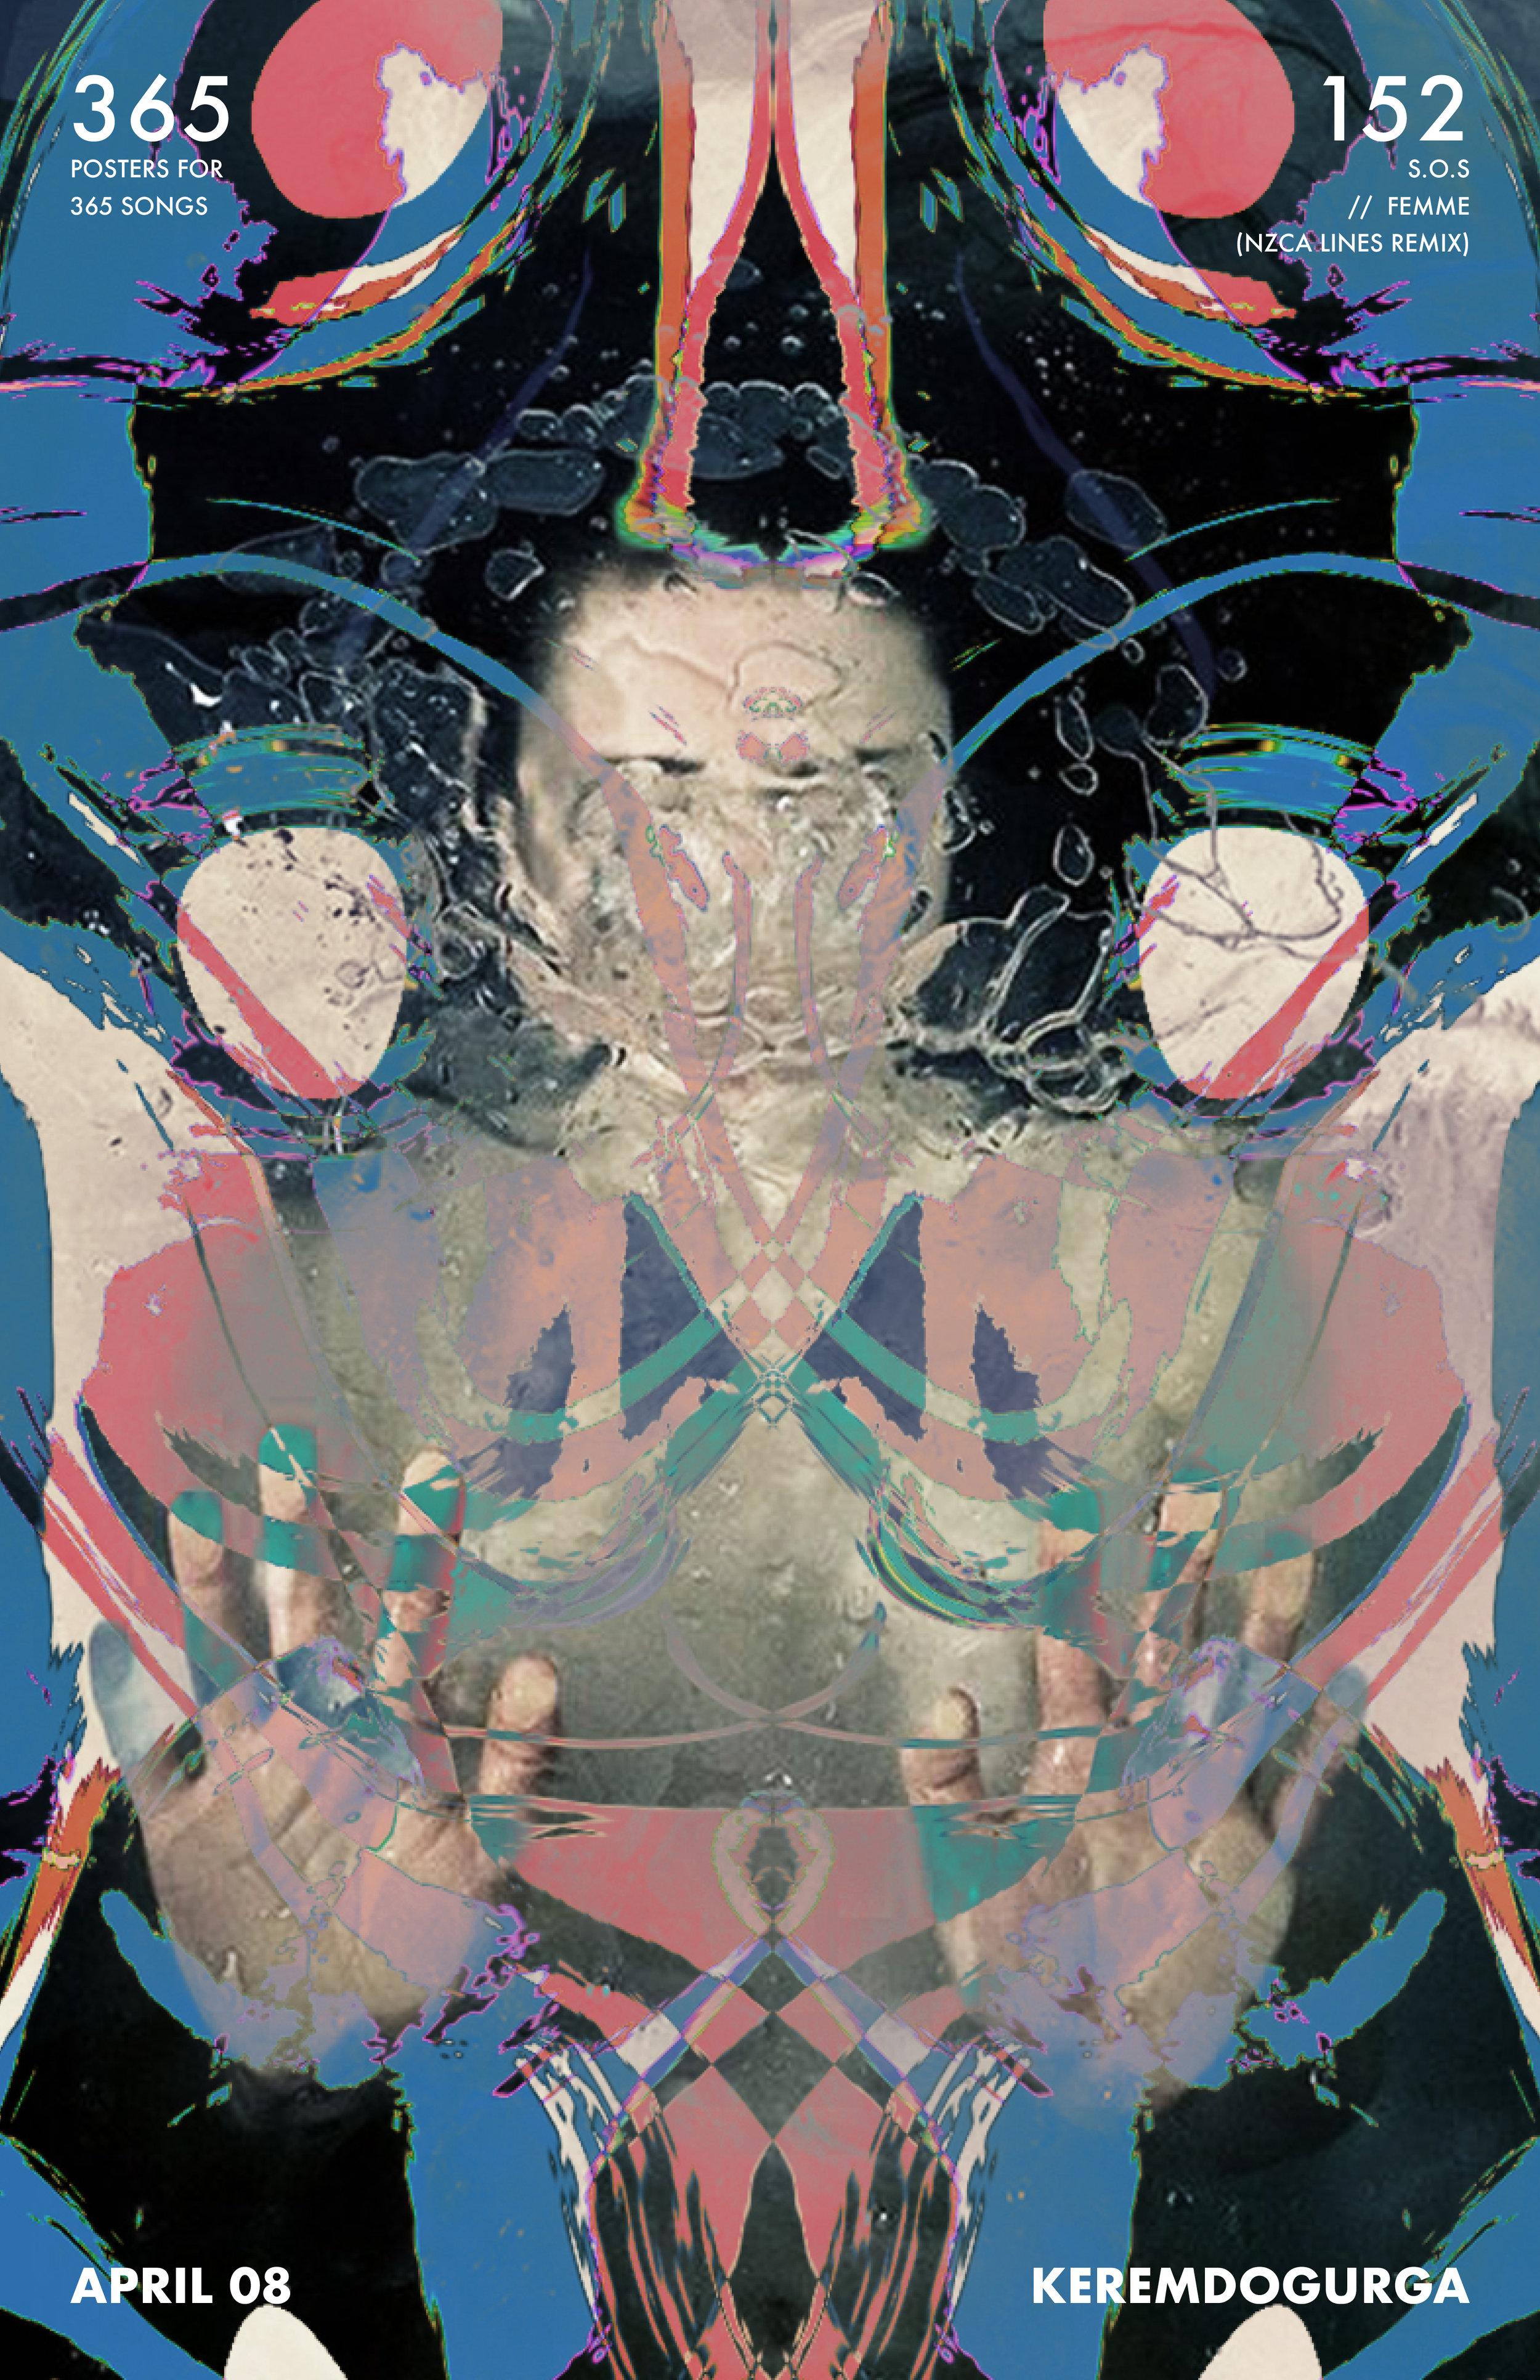 152 S.O.S // Femme (NZCA Lines Remix)